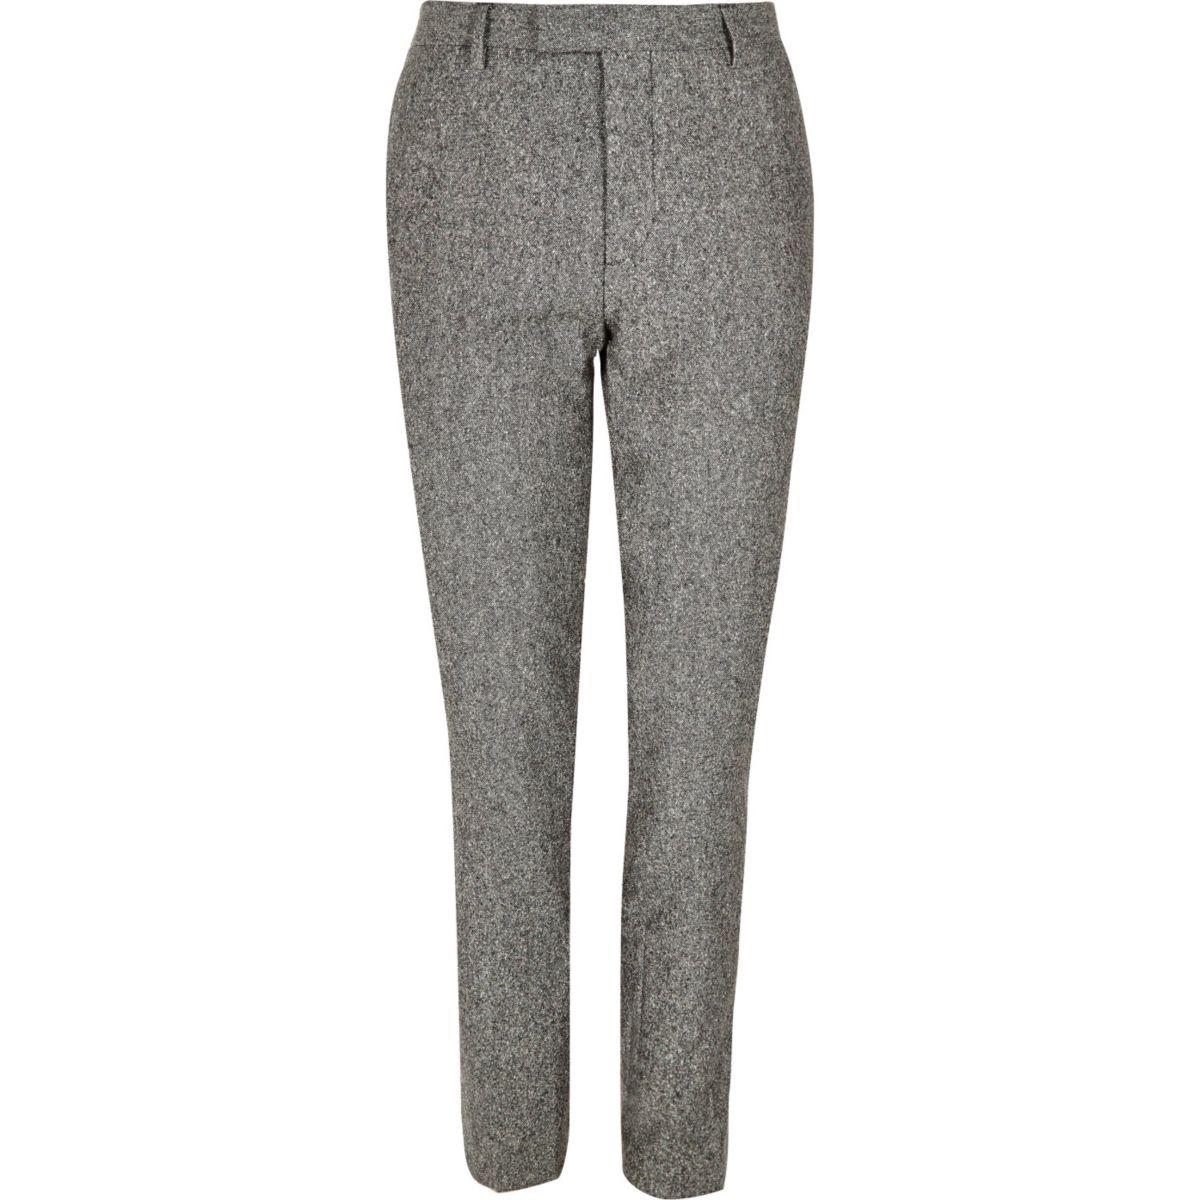 Grey neppy skinny suit trousers